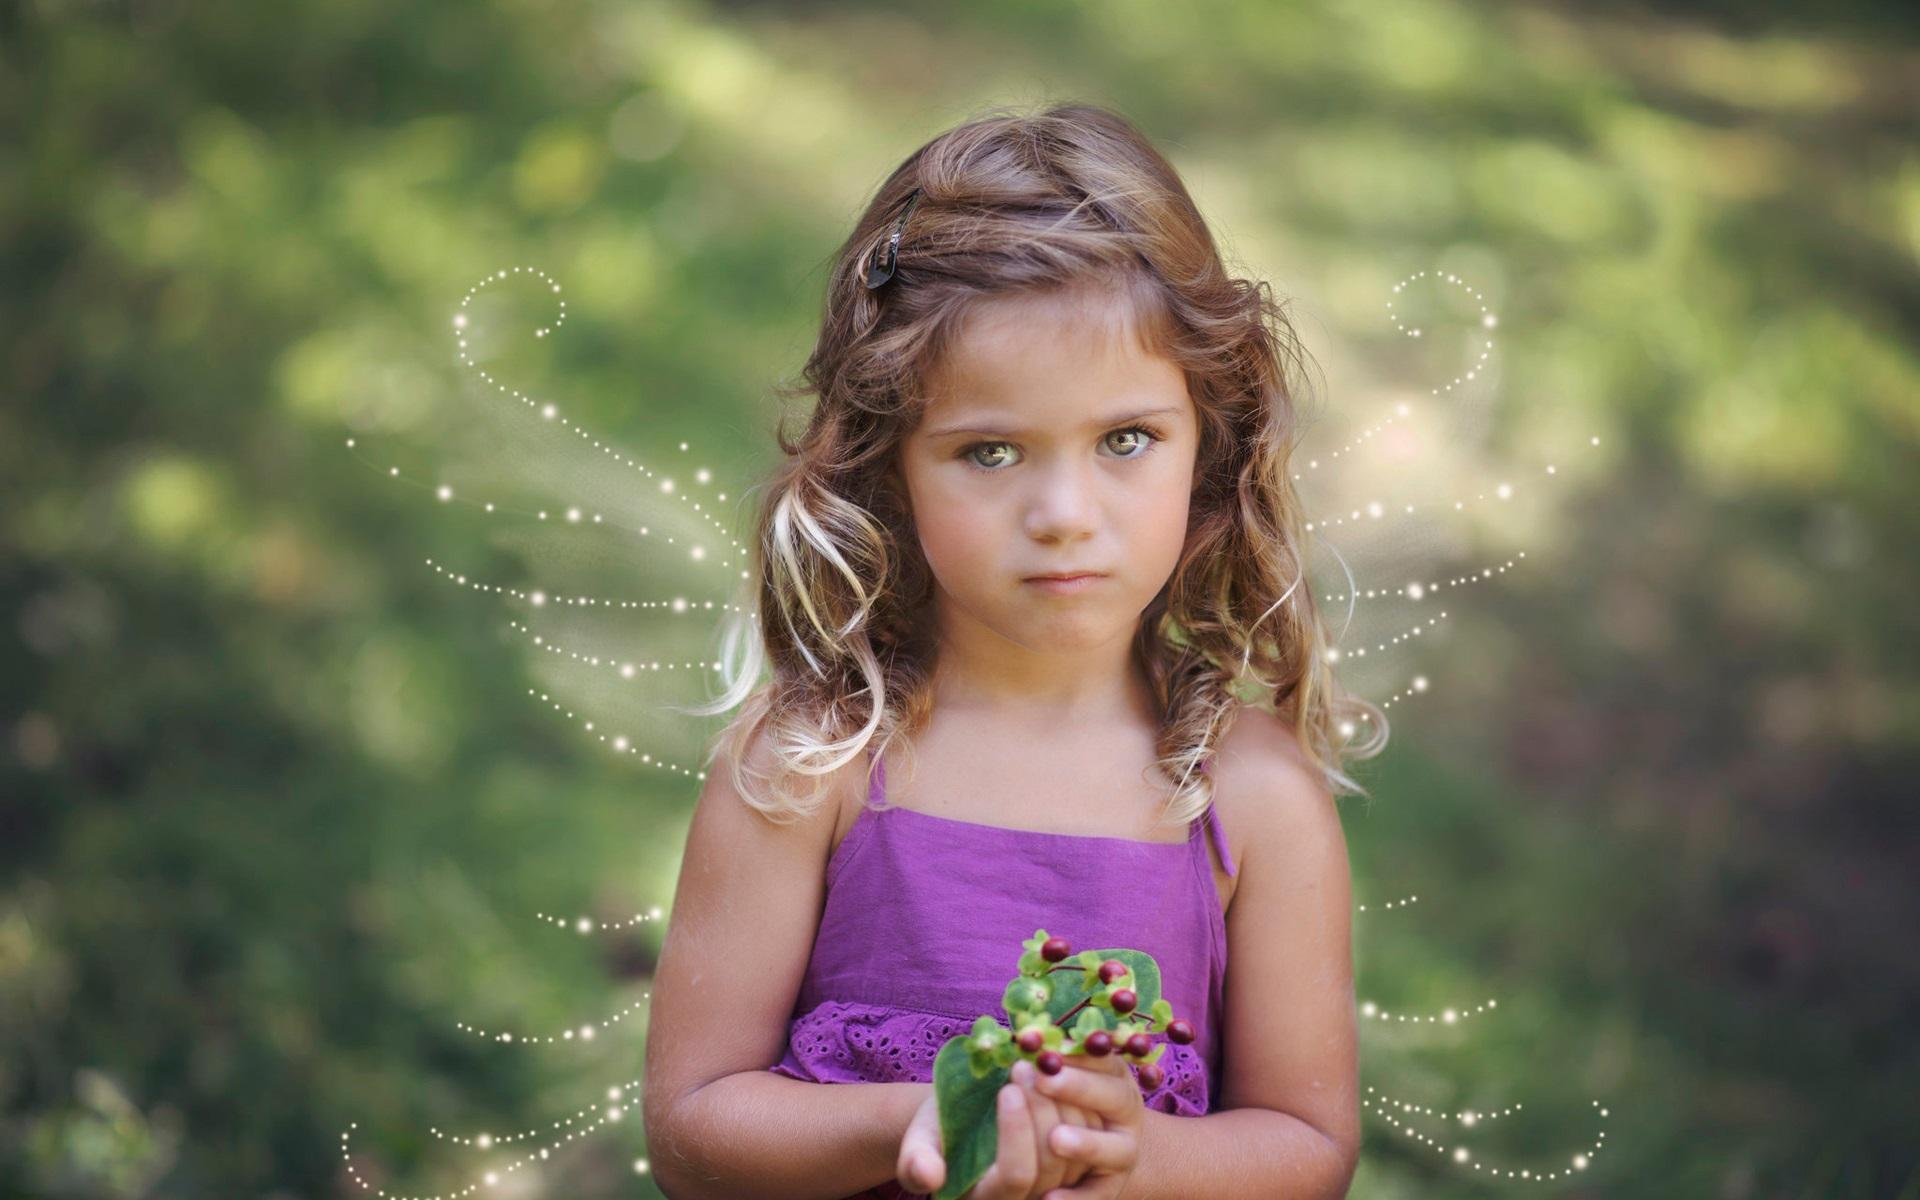 wallpaper cute little girl, wings, angel 1920x1200 hd picture, image